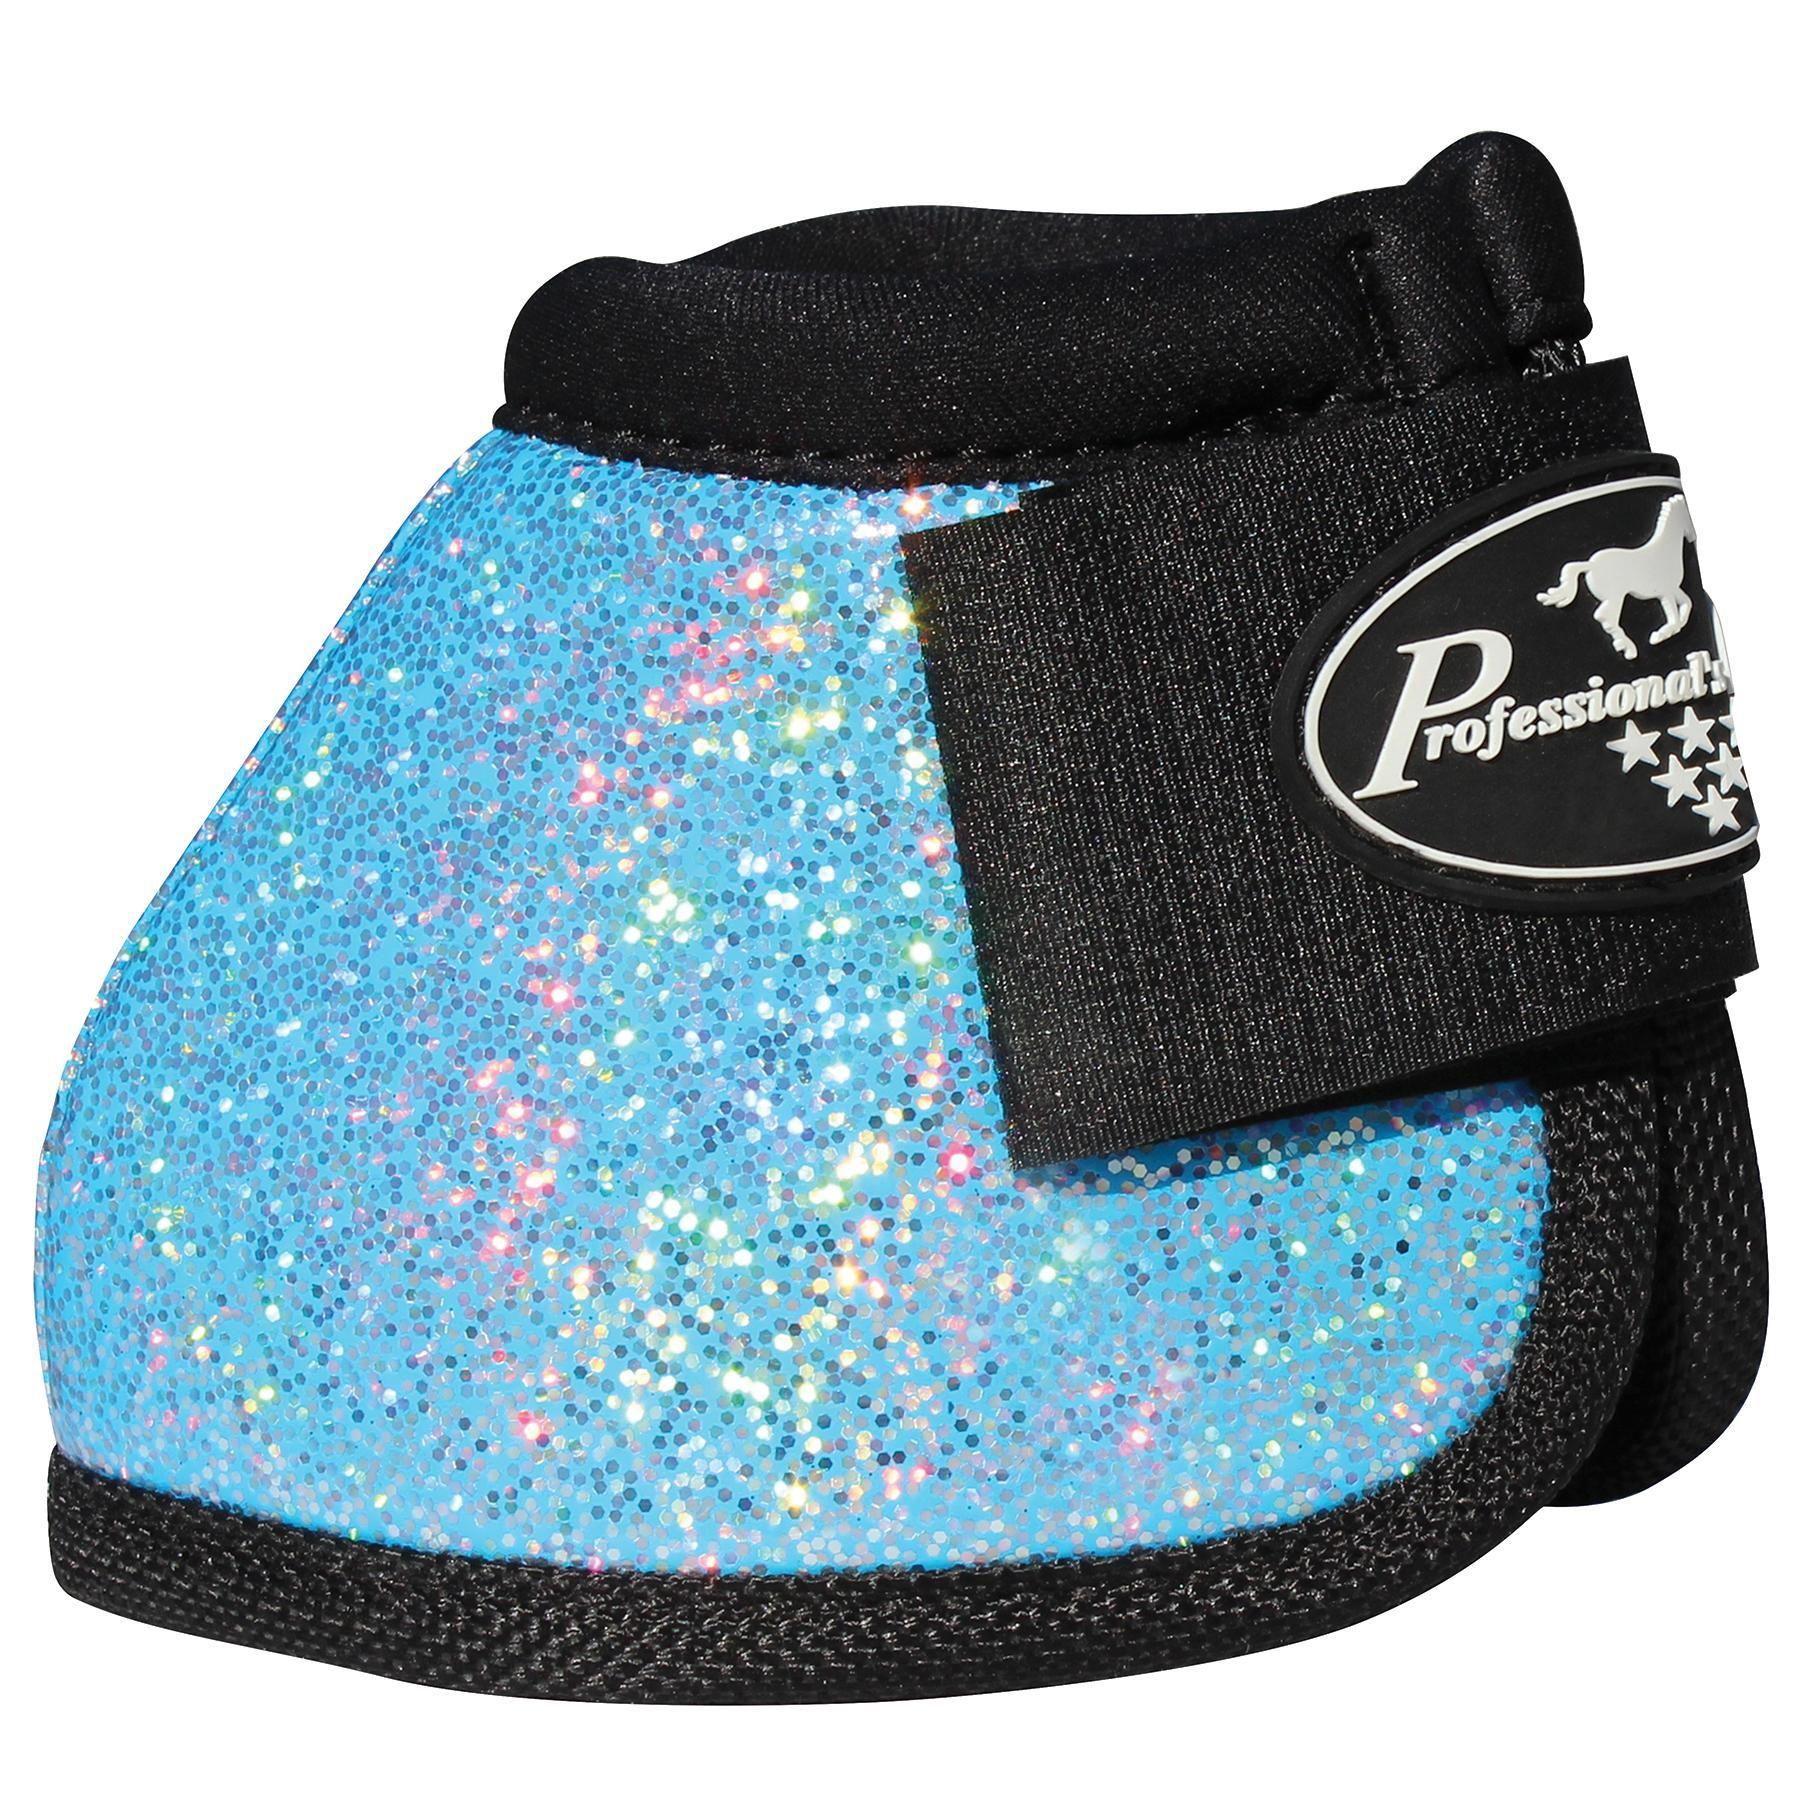 Professional/'s Choice Turquoise Glitter no turn bell boots Medium M Pro Prof